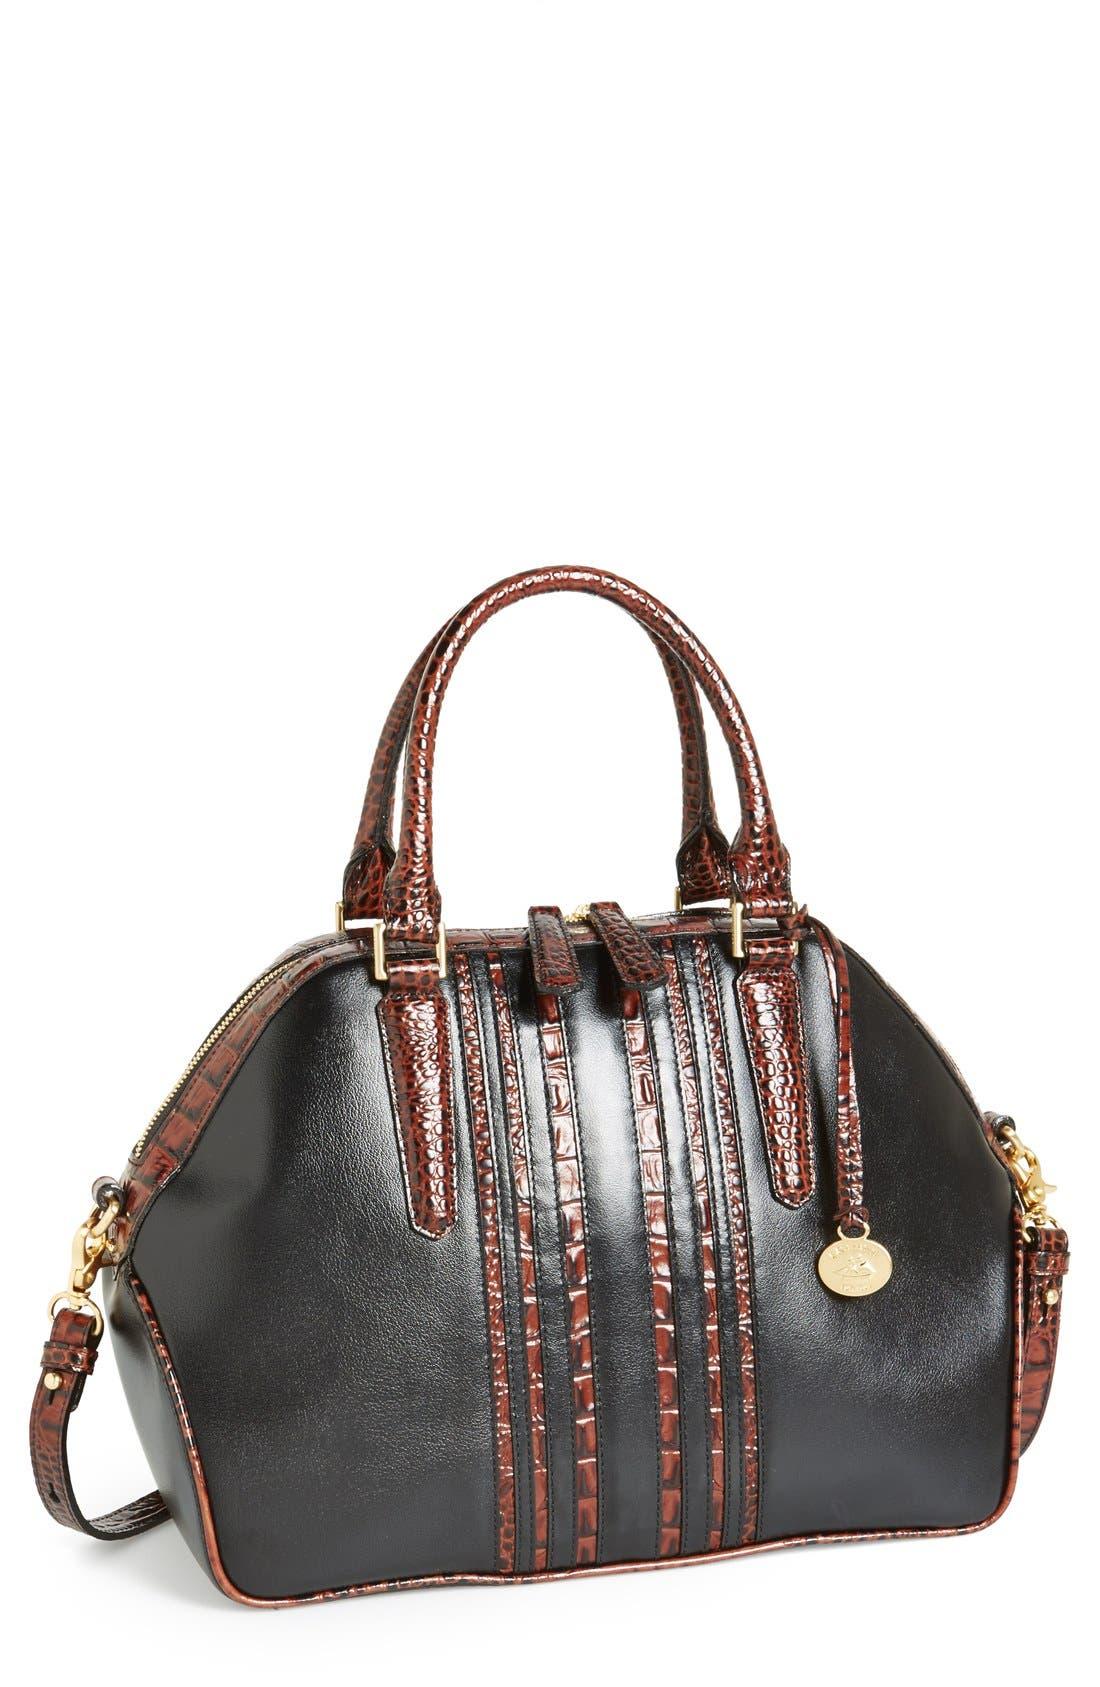 Main Image - Brahmin 'Hudson' Leather Satchel